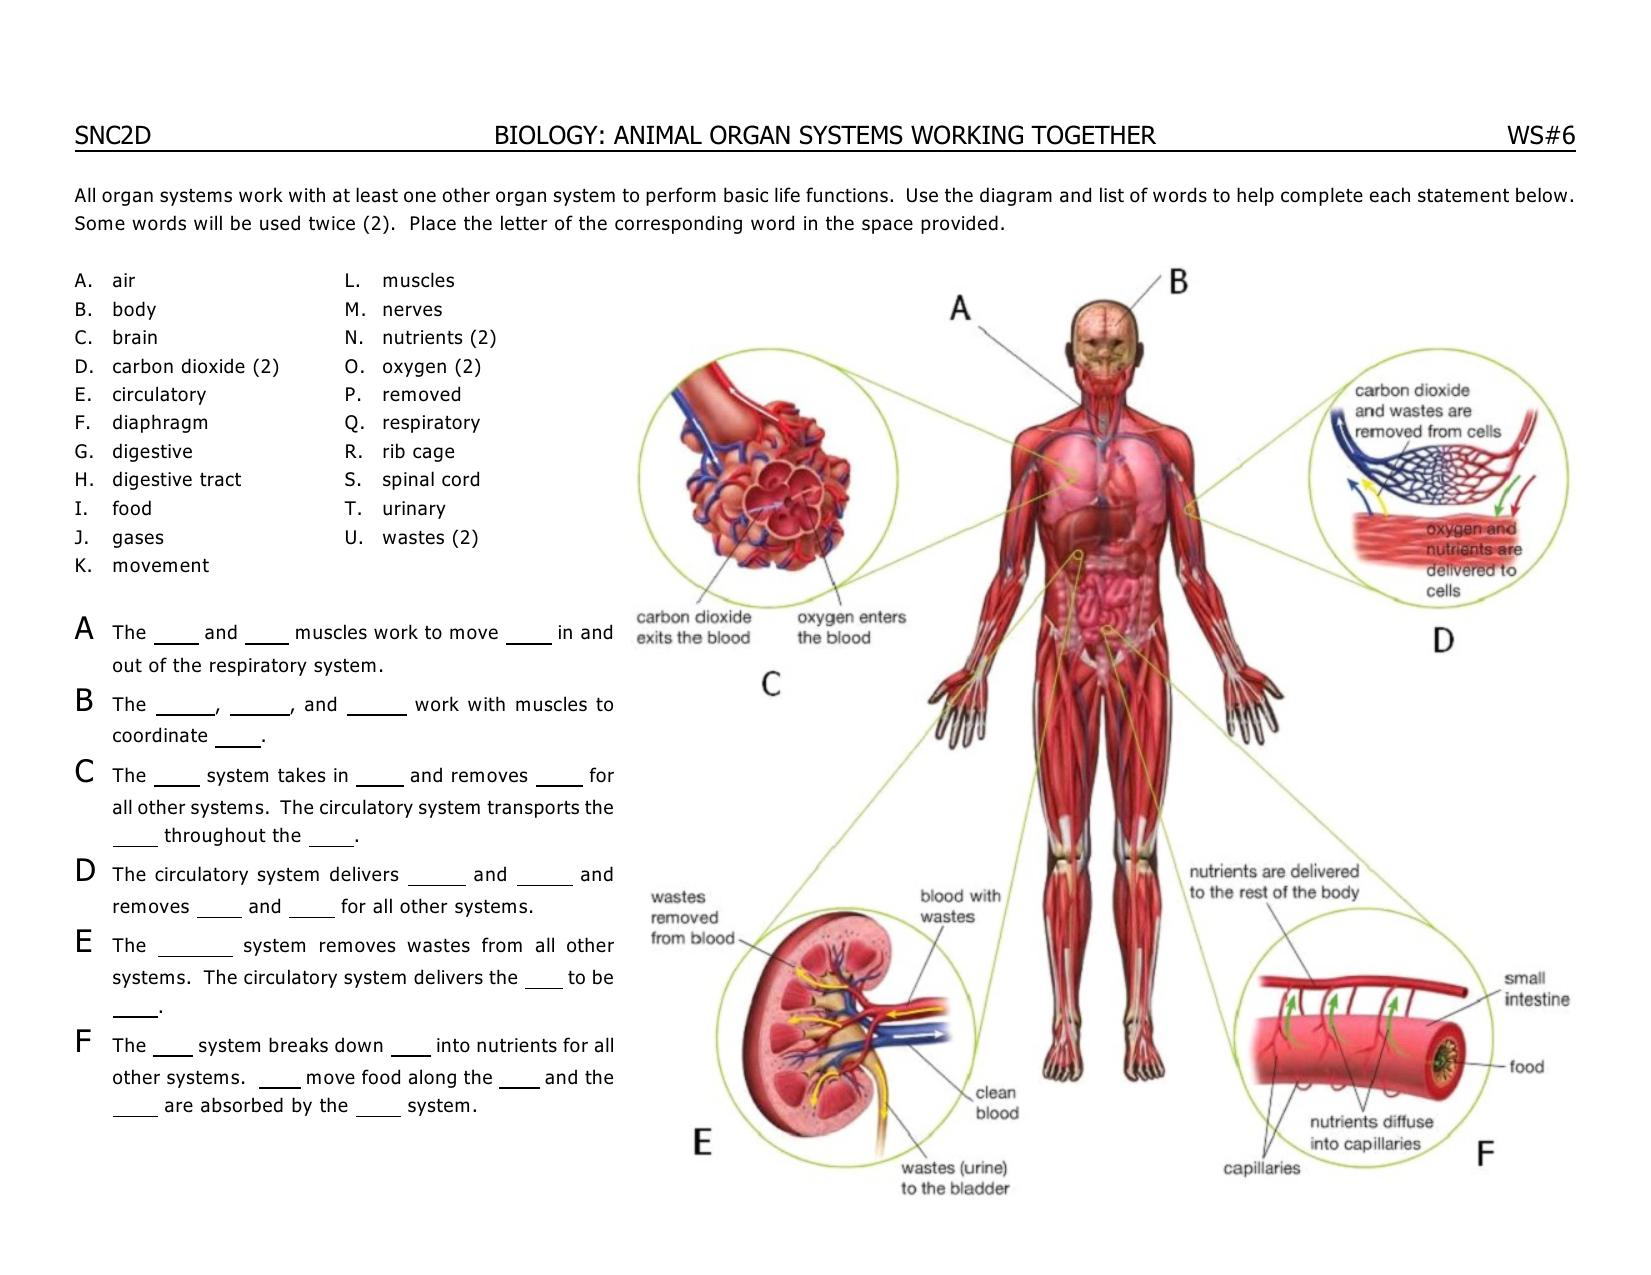 SNC2D BIOLOGY: ANIMAL ORGAN SYSTEMS WORKING